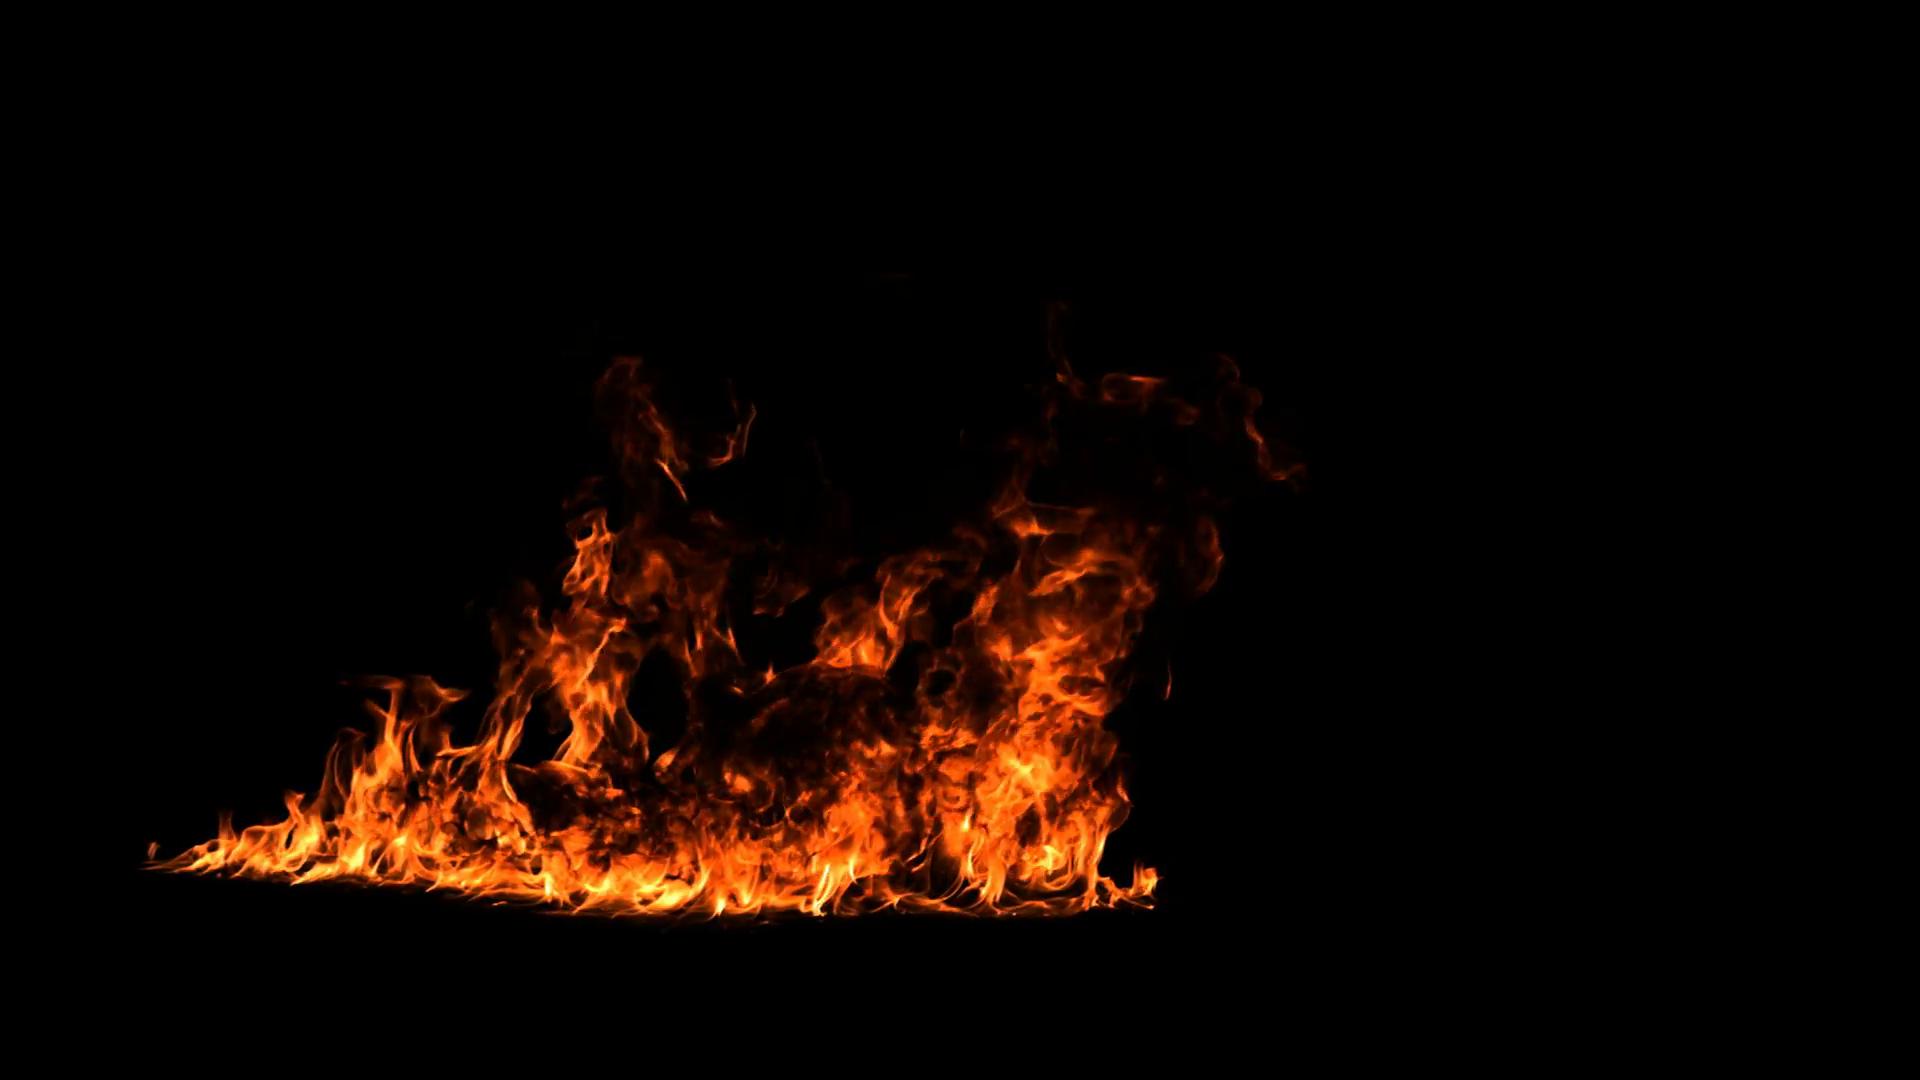 HD & 4K Flame Storyblocks Videos: Royalty.